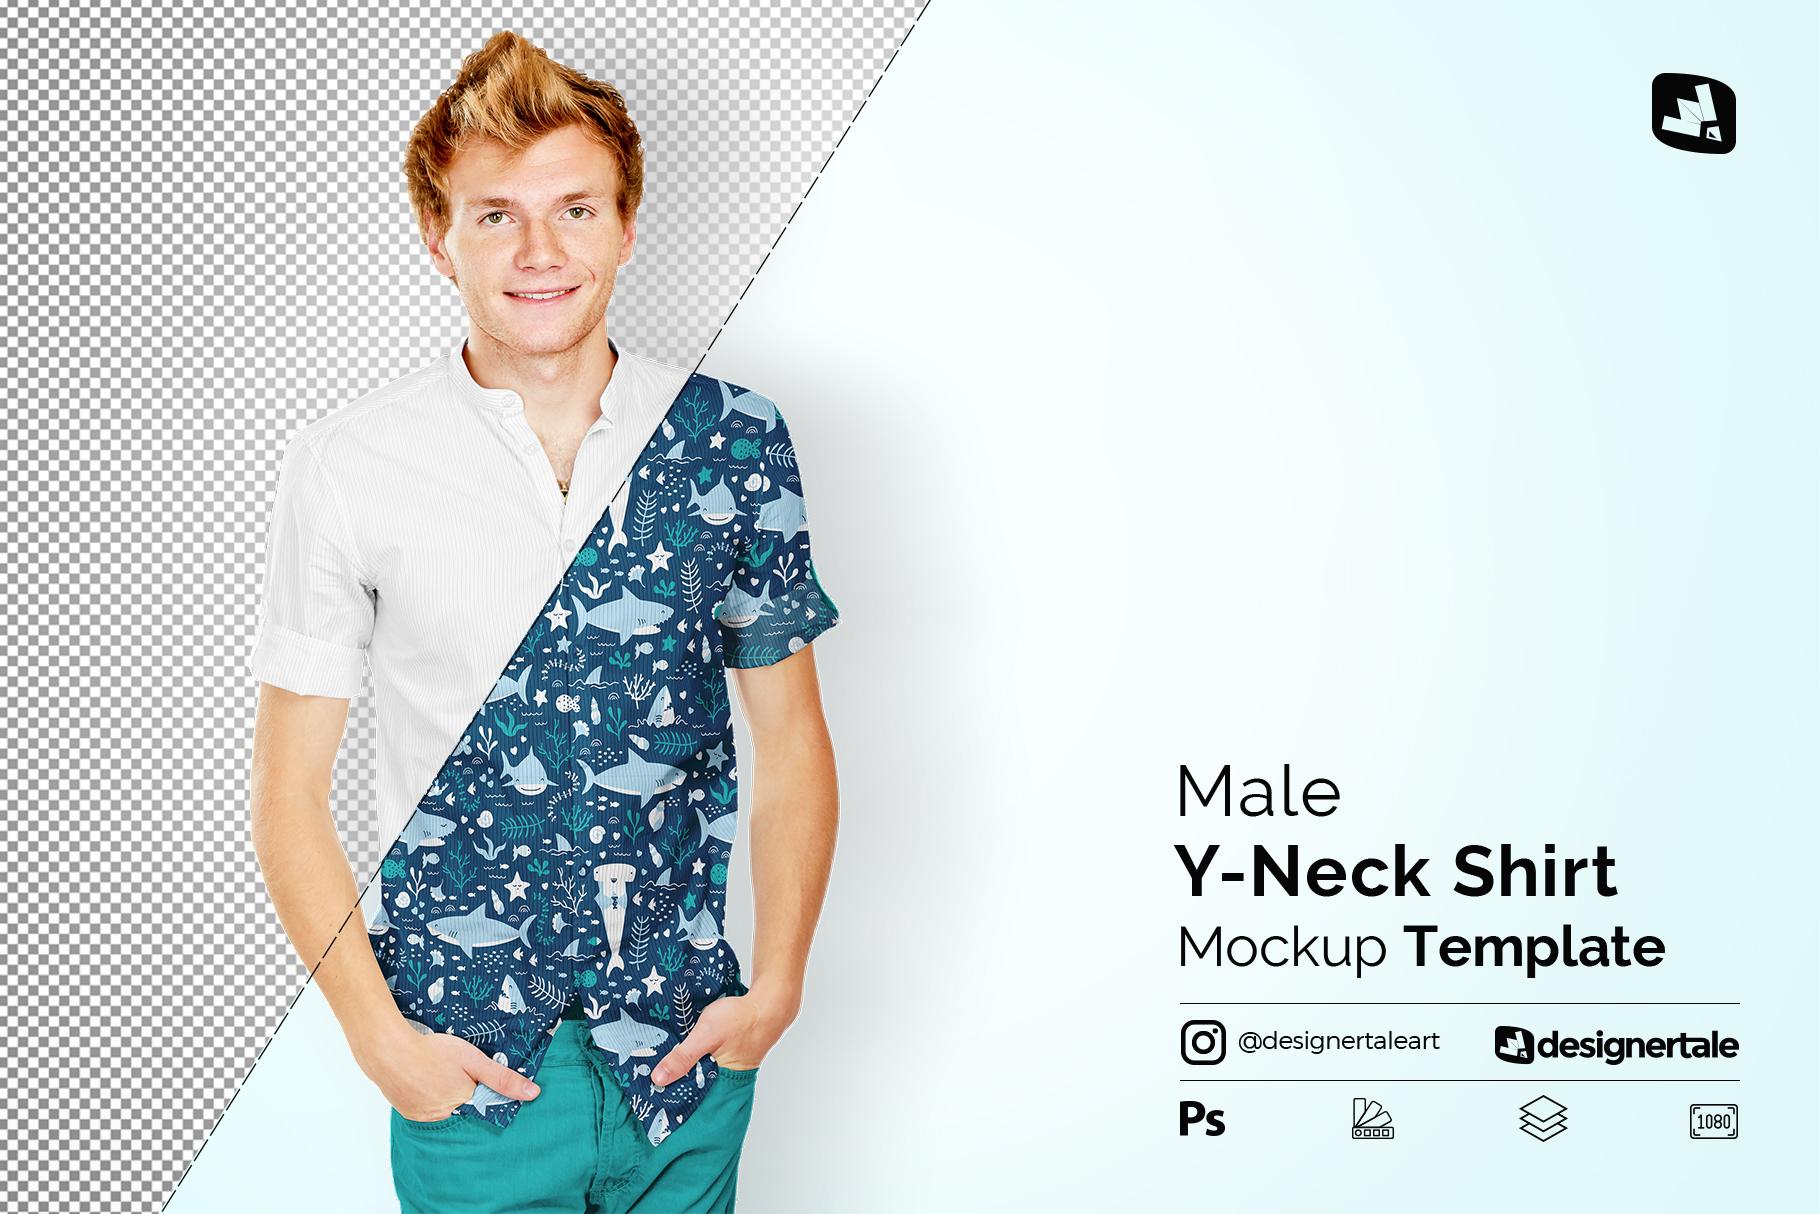 male y-neck shirt mockup